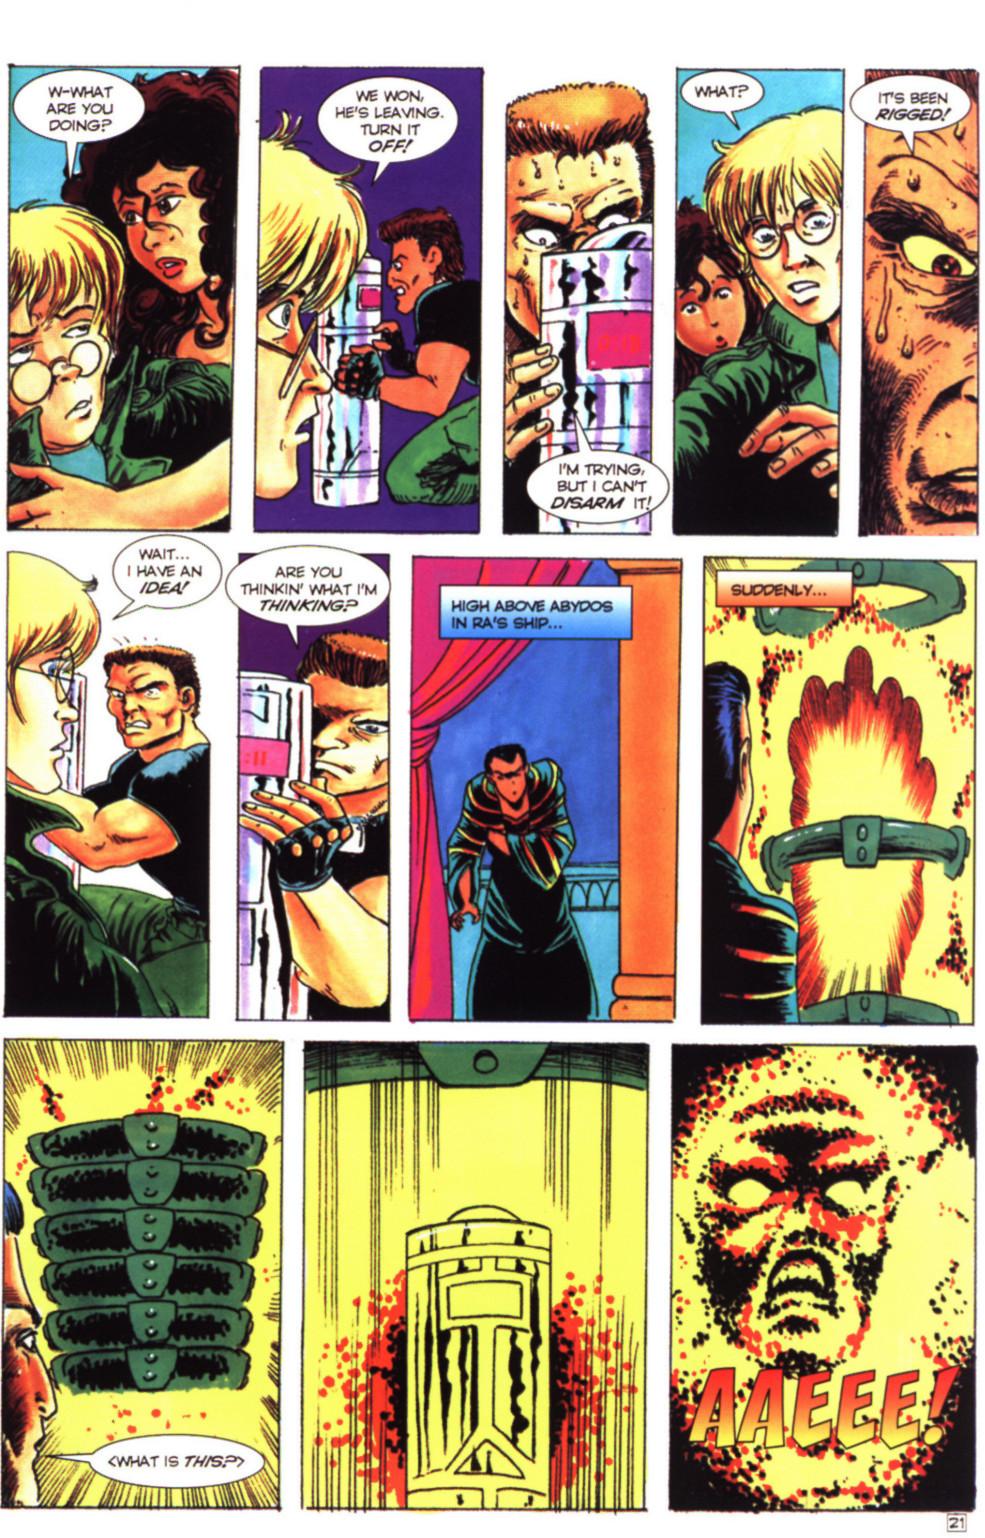 Read online Stargate comic -  Issue #4 - 23